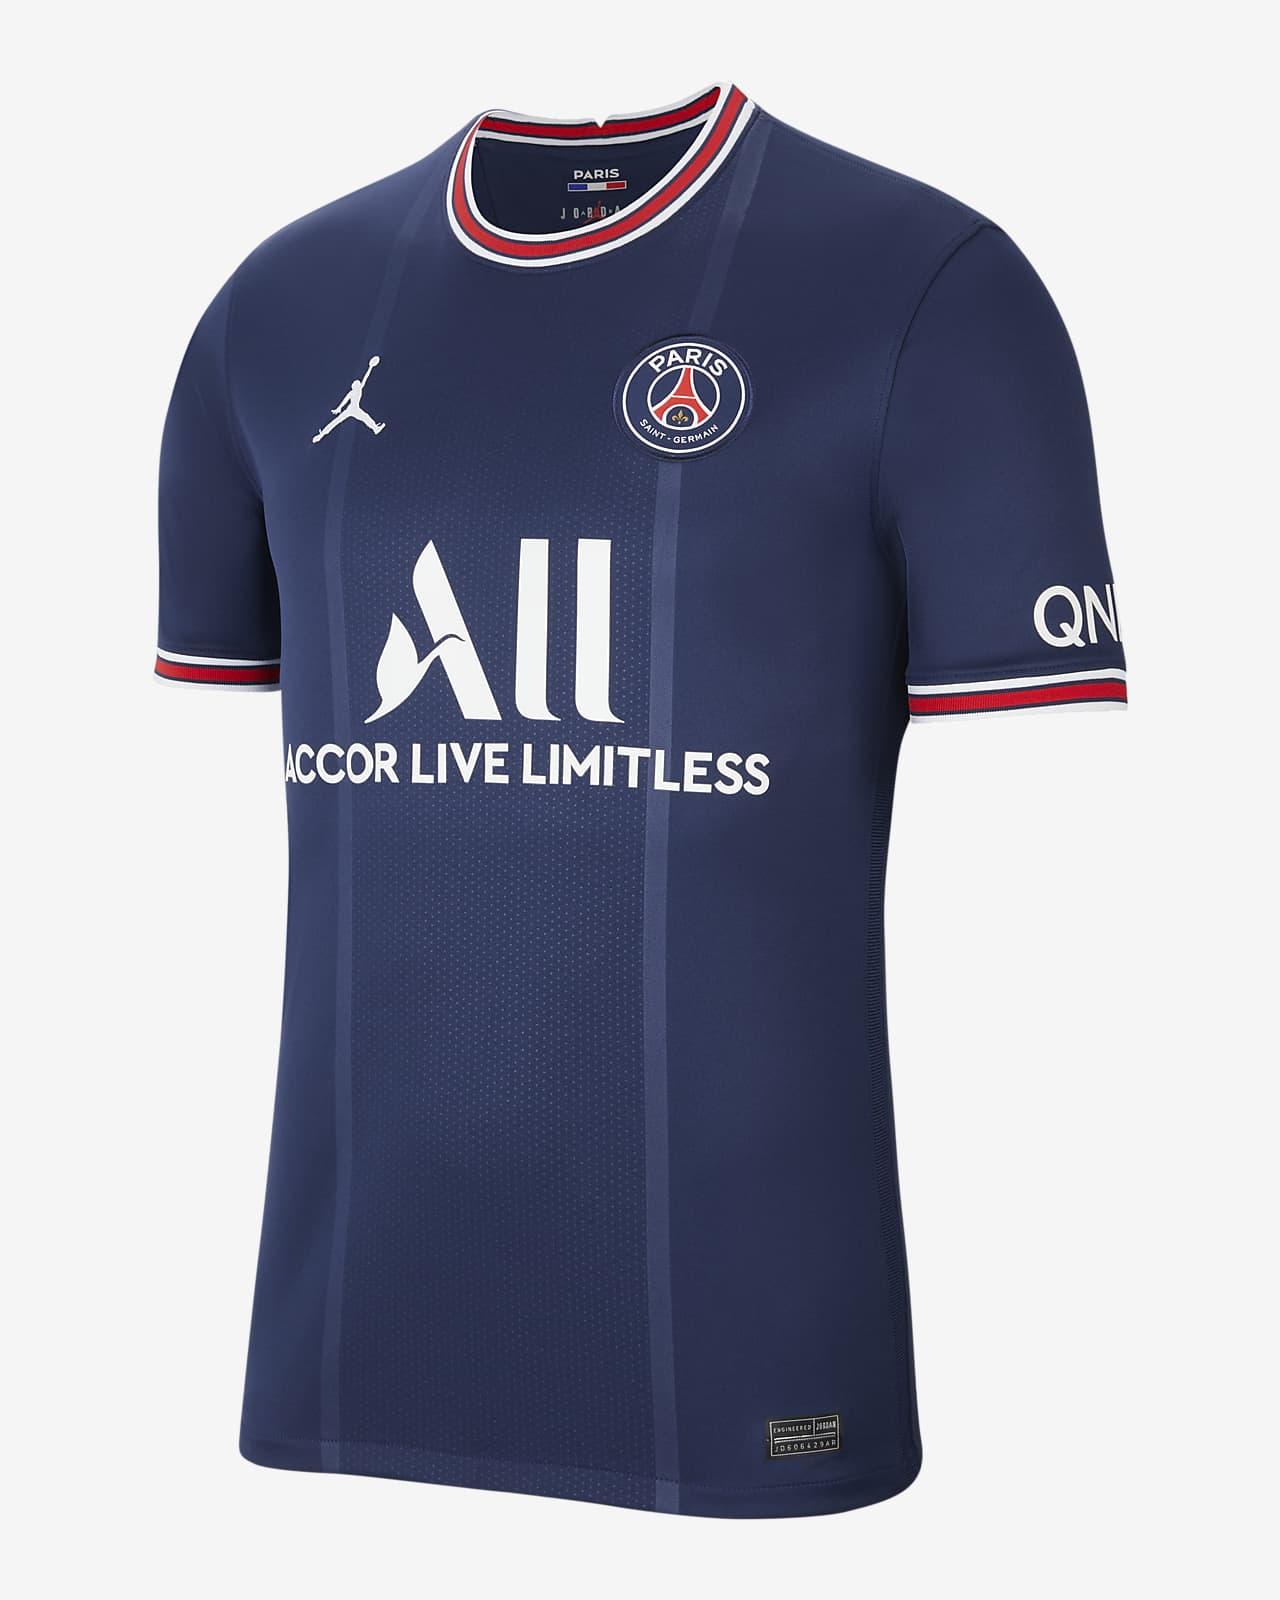 Jersey de fútbol del Paris Saint-Germain local 2021/22 Stadium para hombre